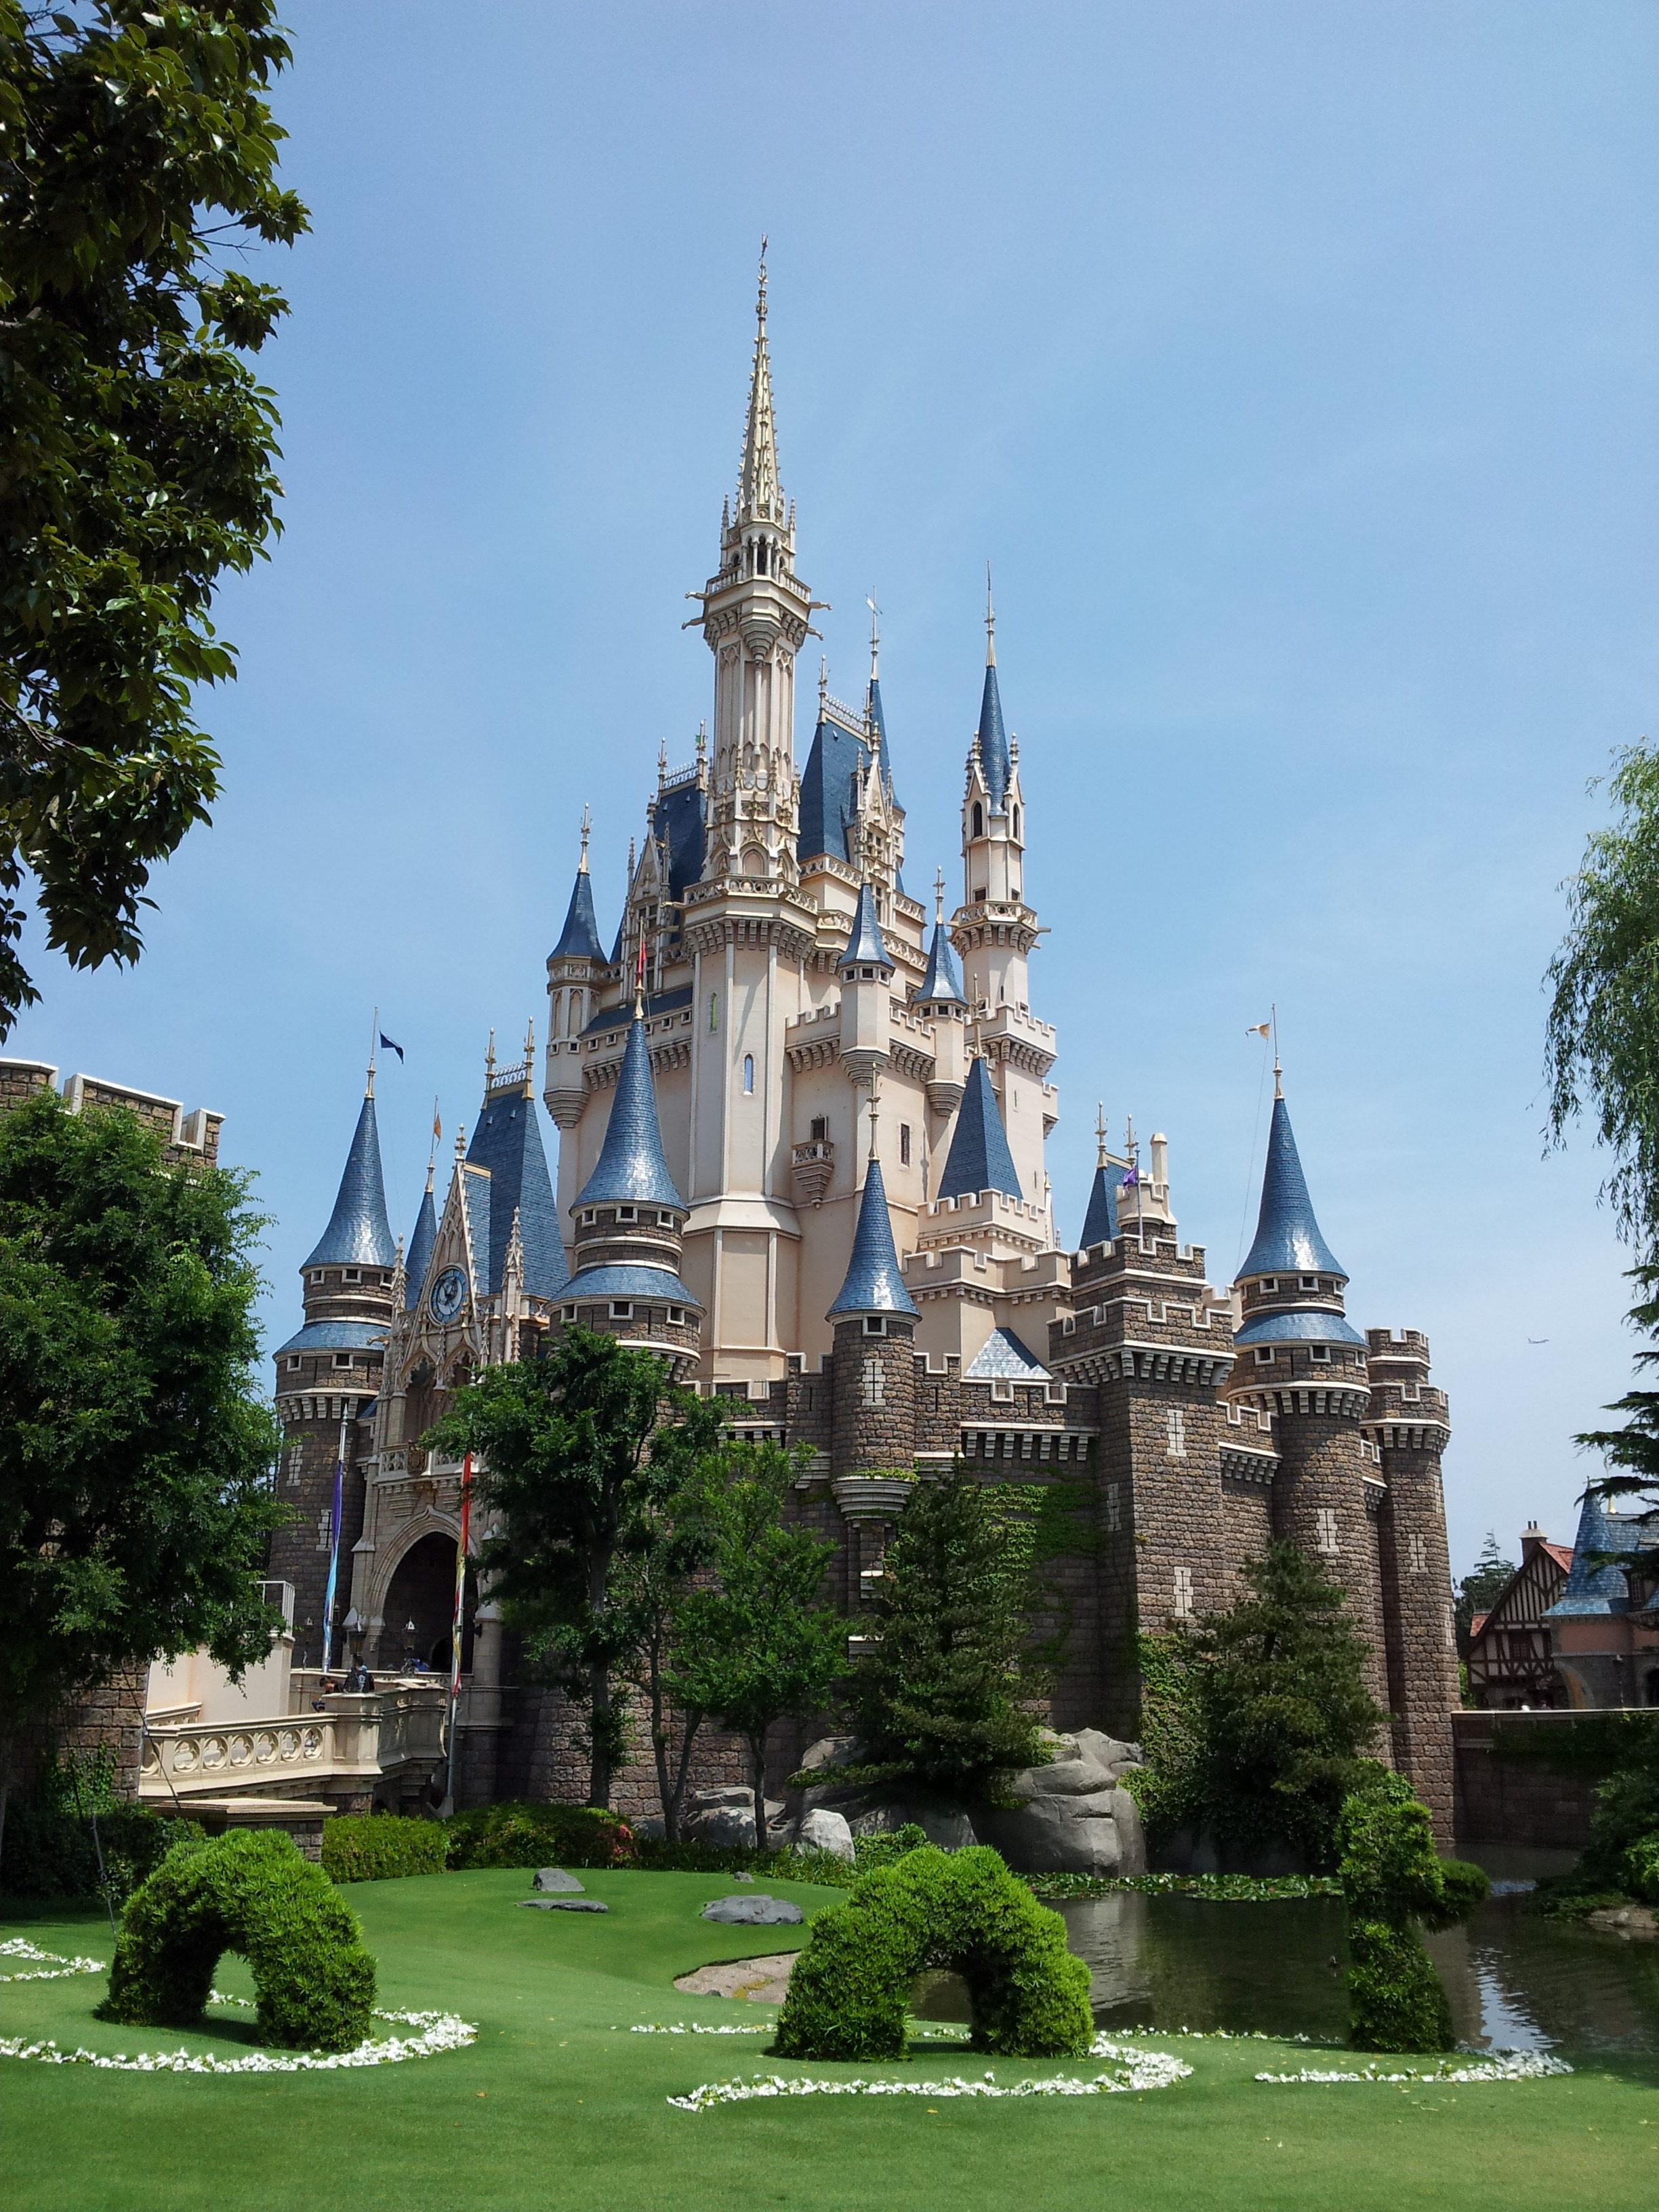 5 Tage in Tokio - Disneyland